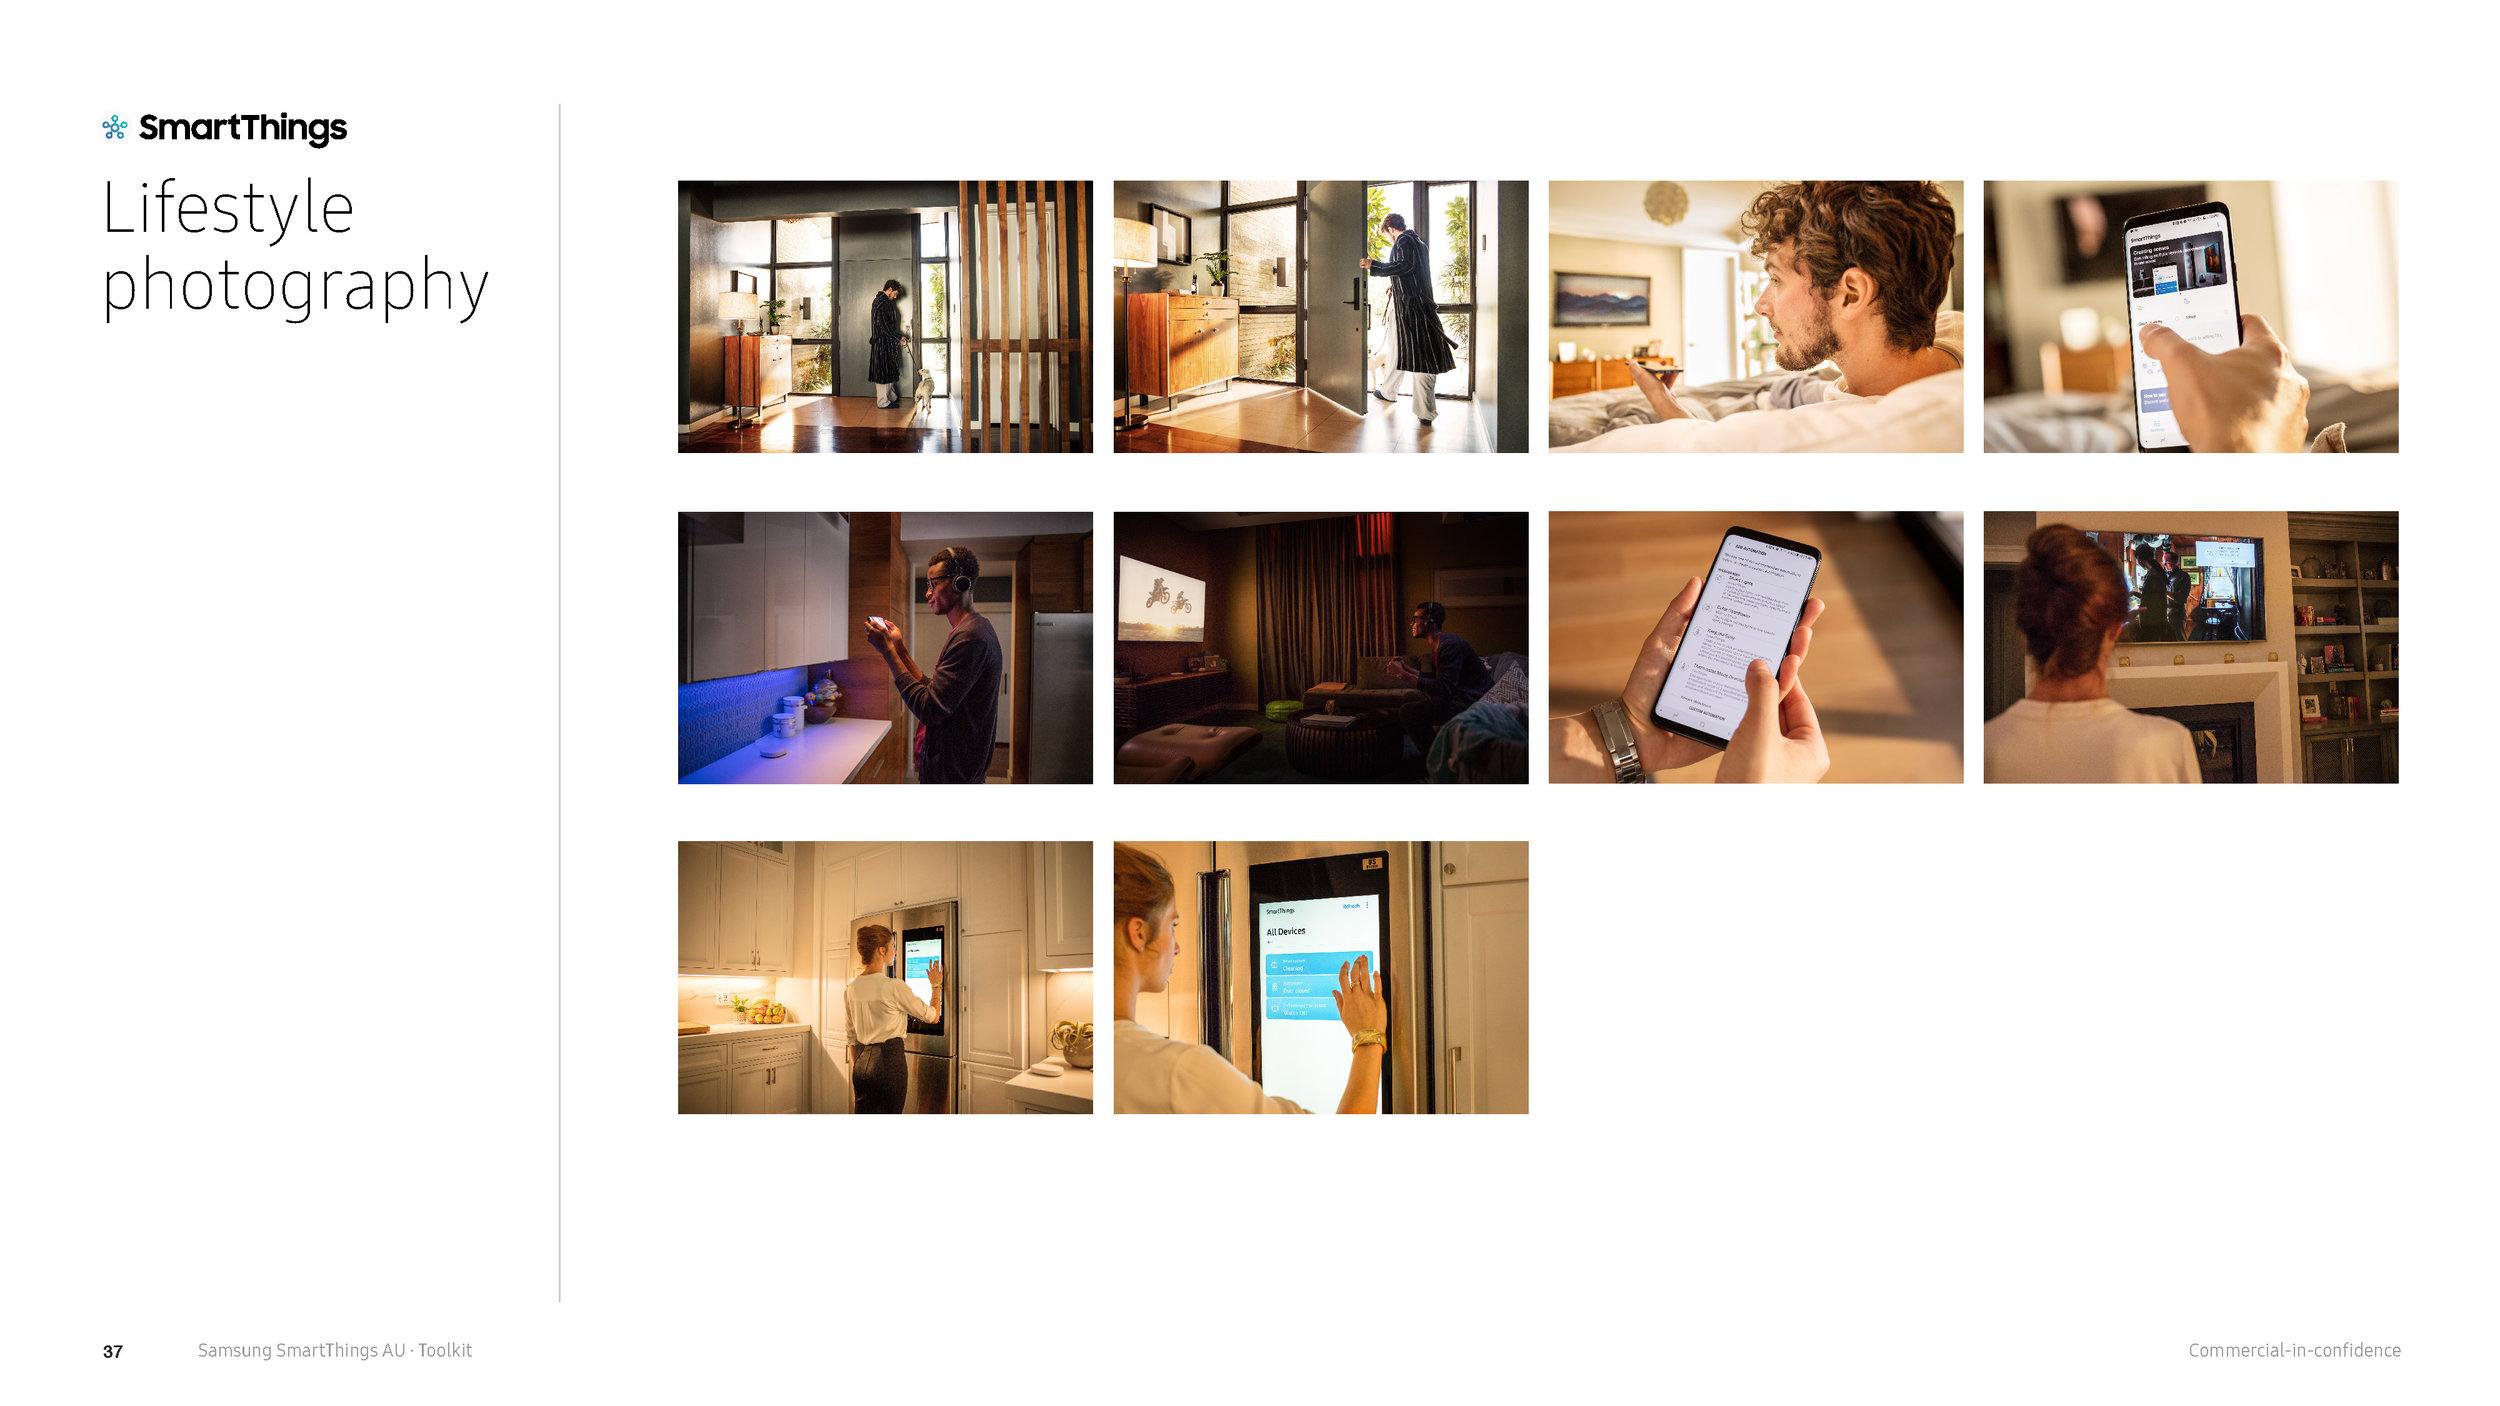 Samsung SmartThings Toolkit 6_Page_37.jpg